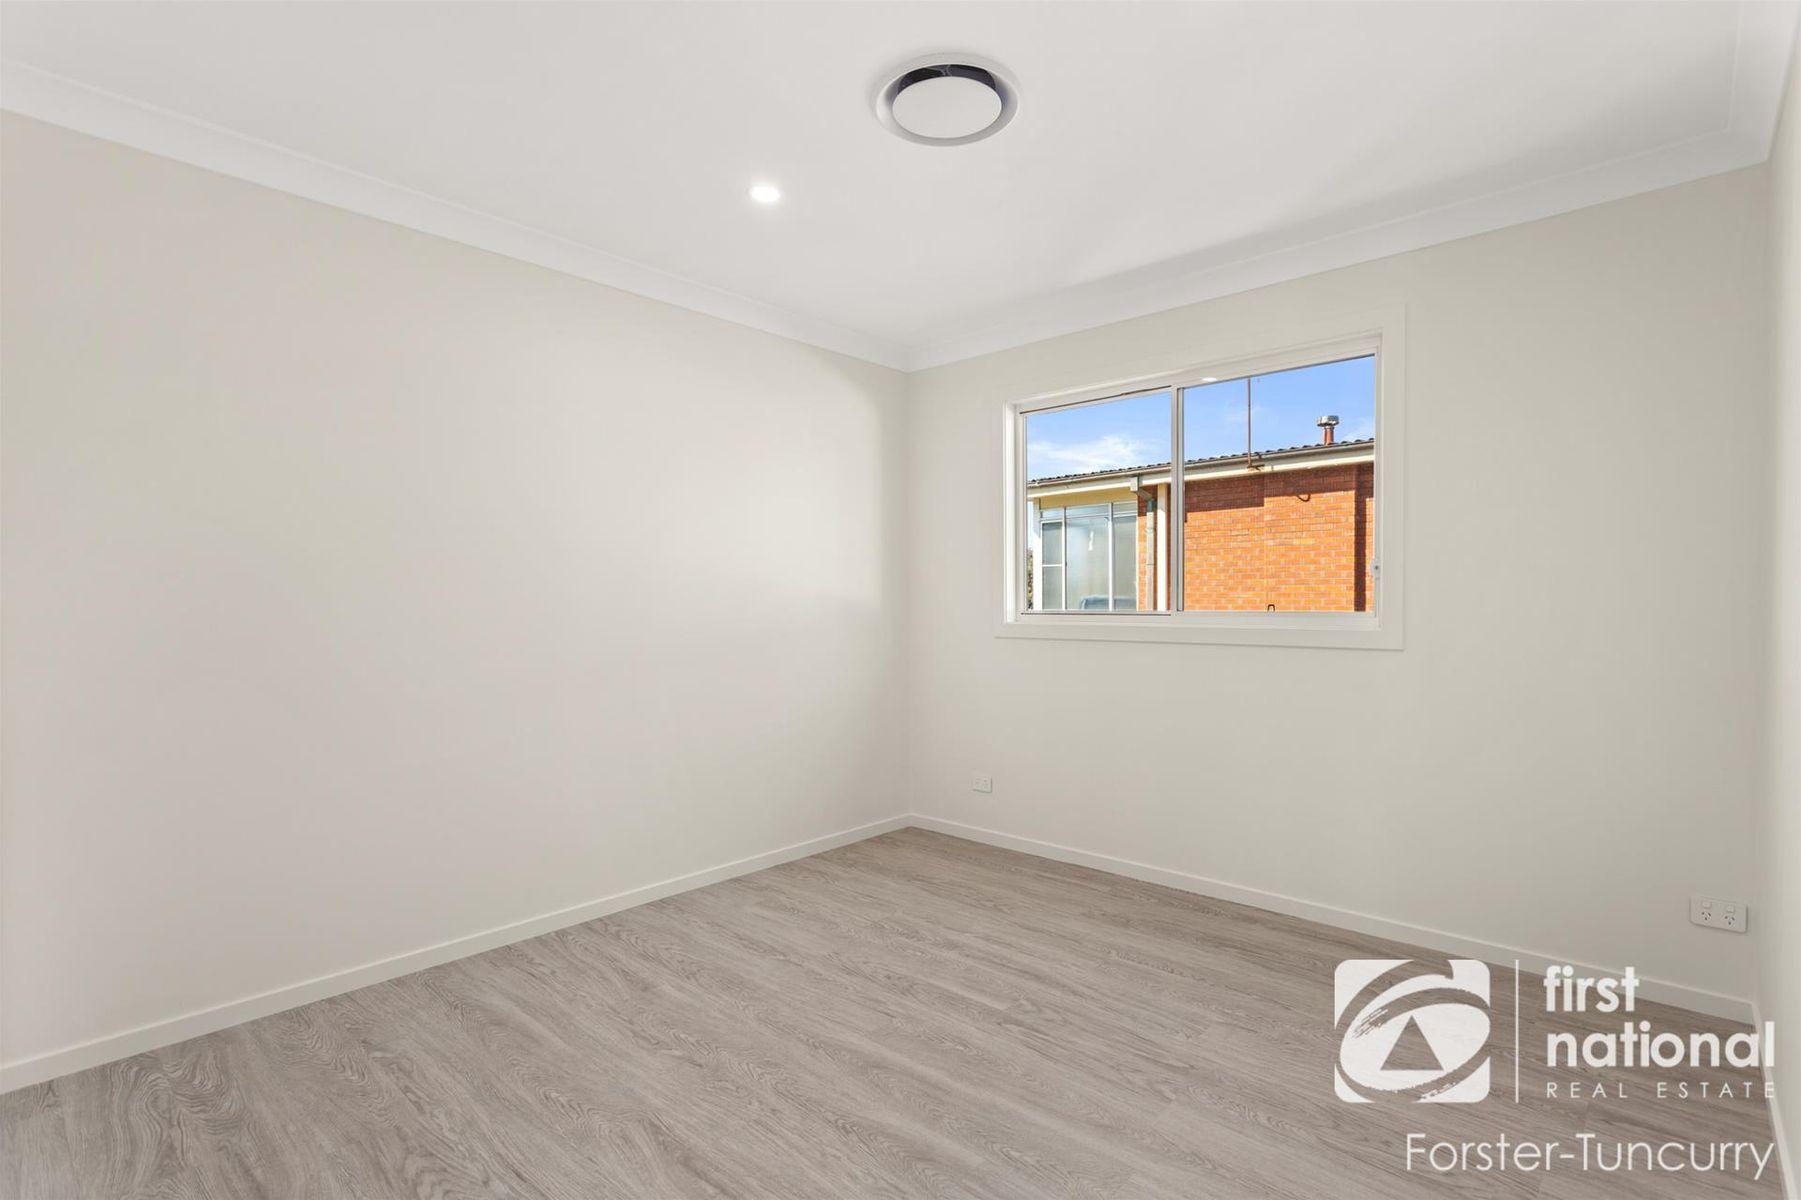 7 Underwood Road, Forster, NSW 2428